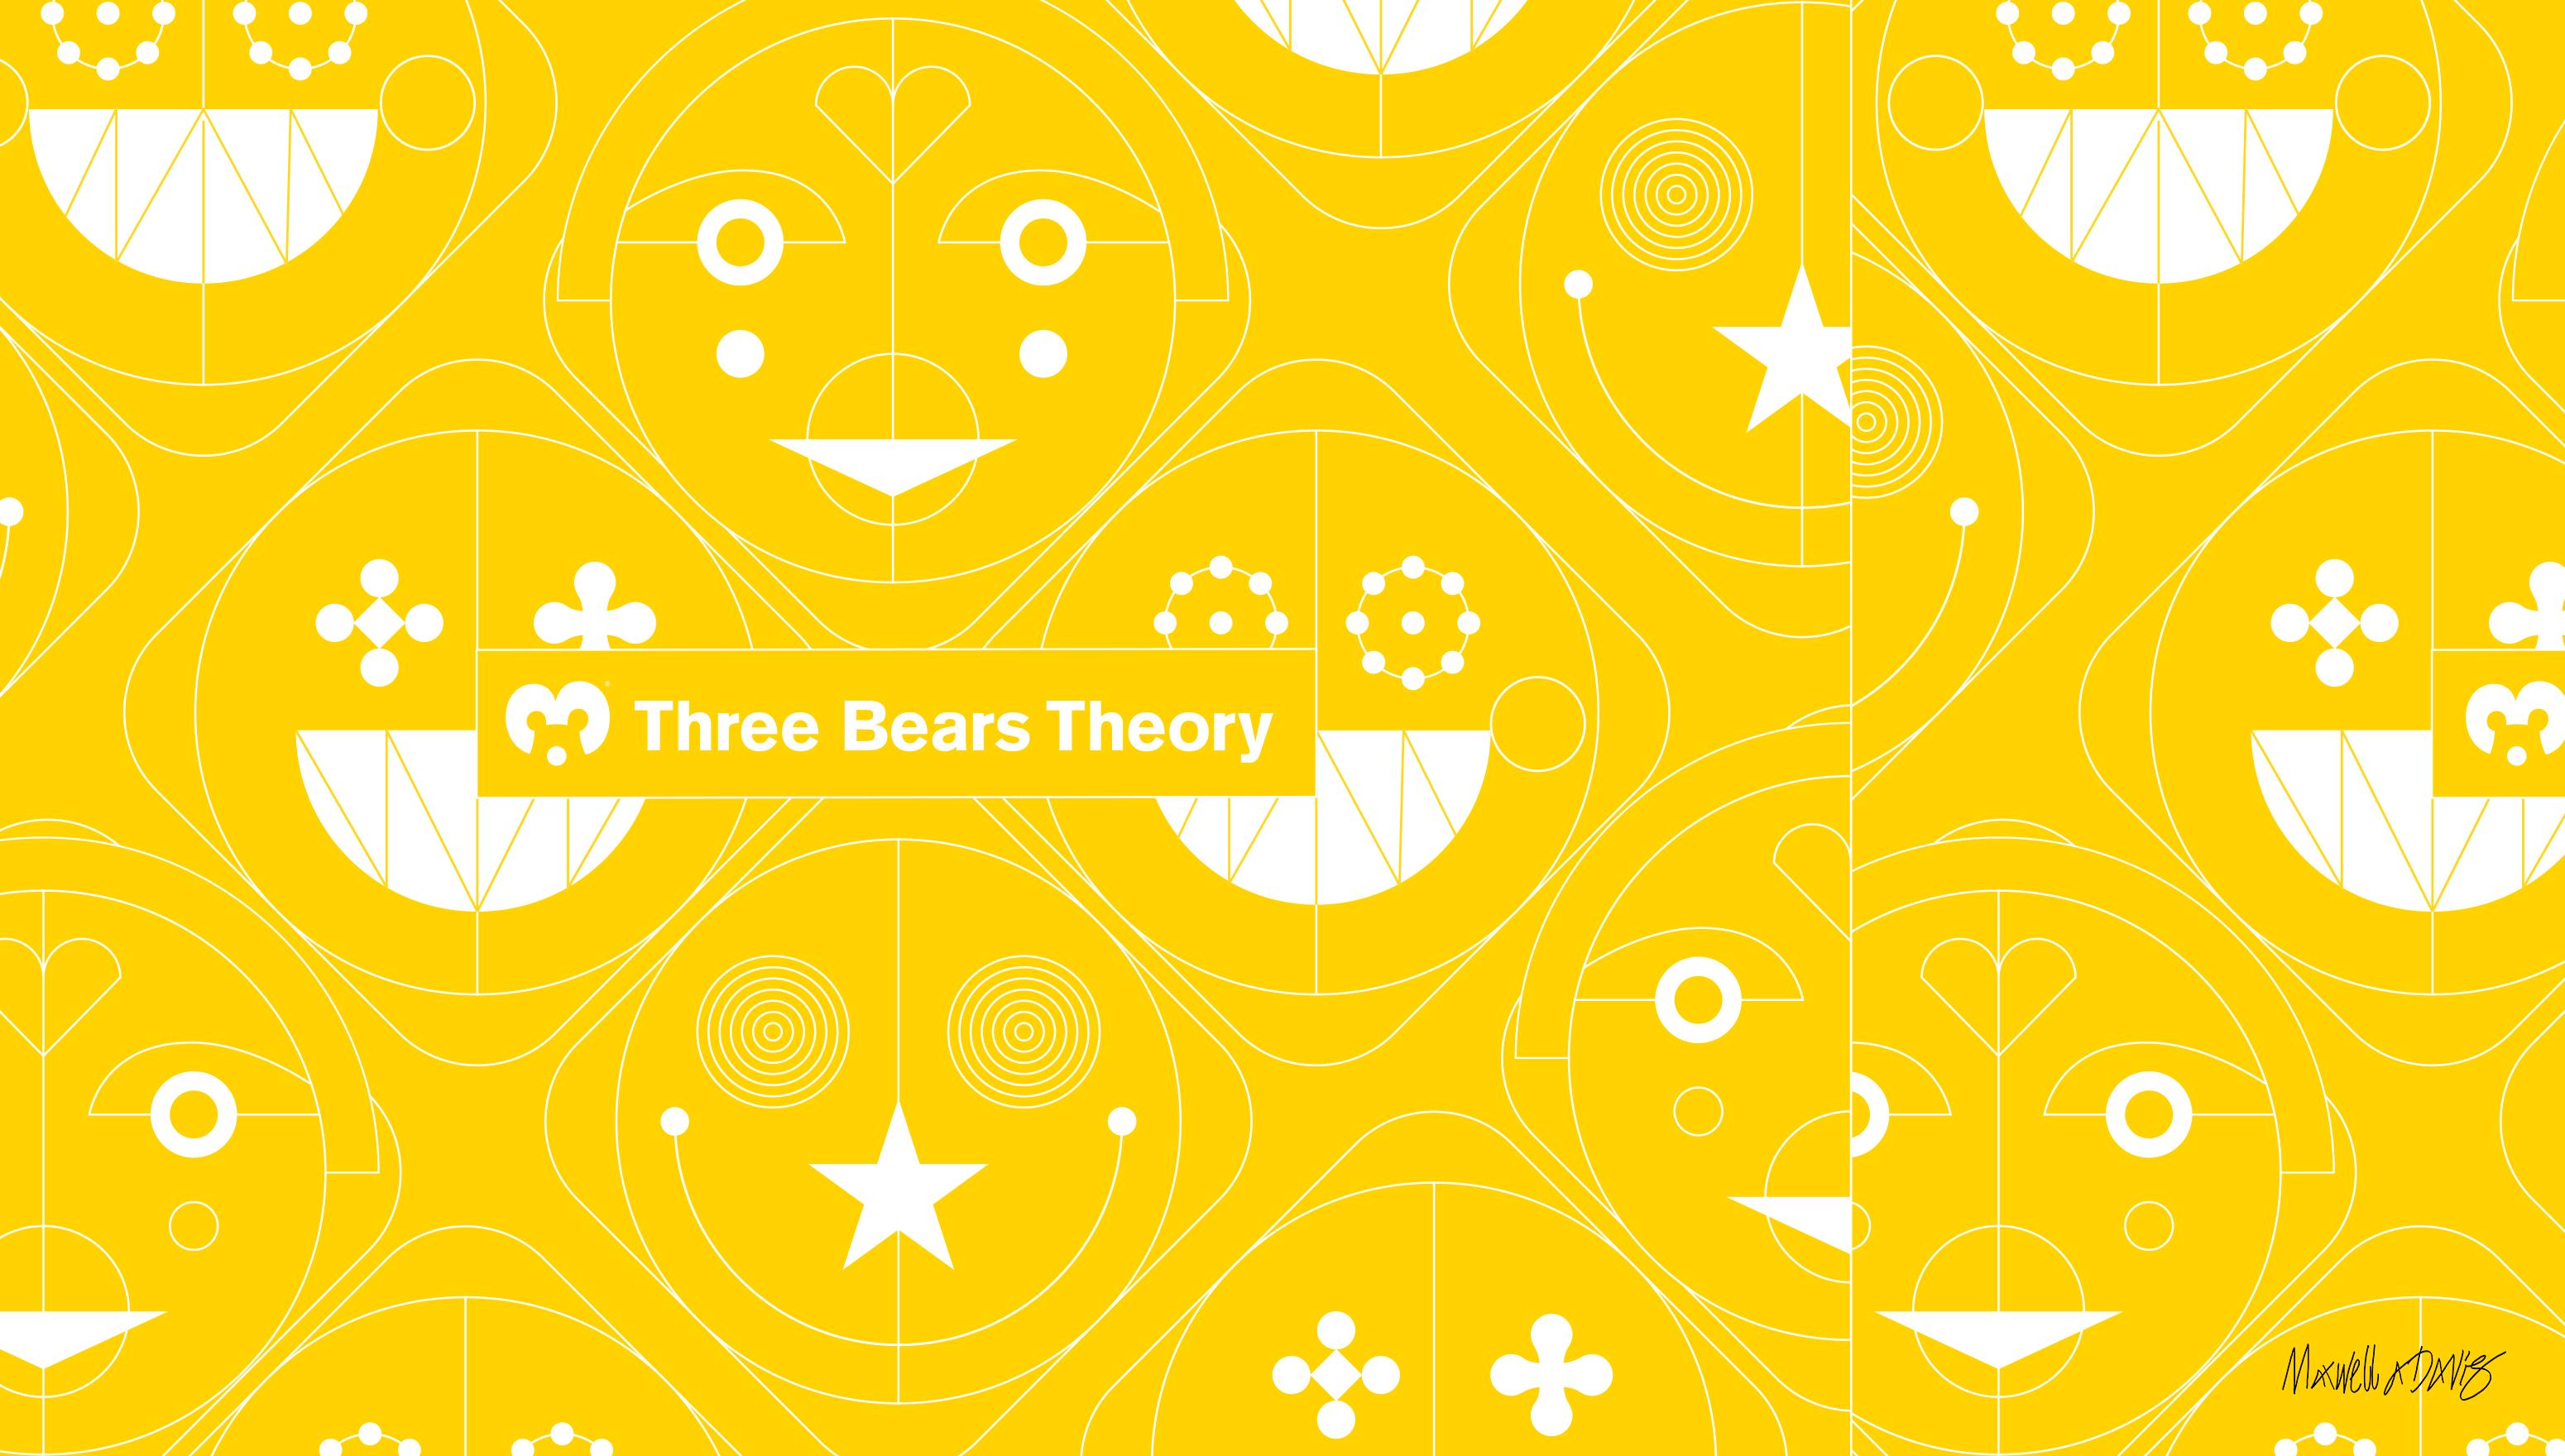 brand strategy, visual identity and motion design, studio three bears theory (studiotbt)